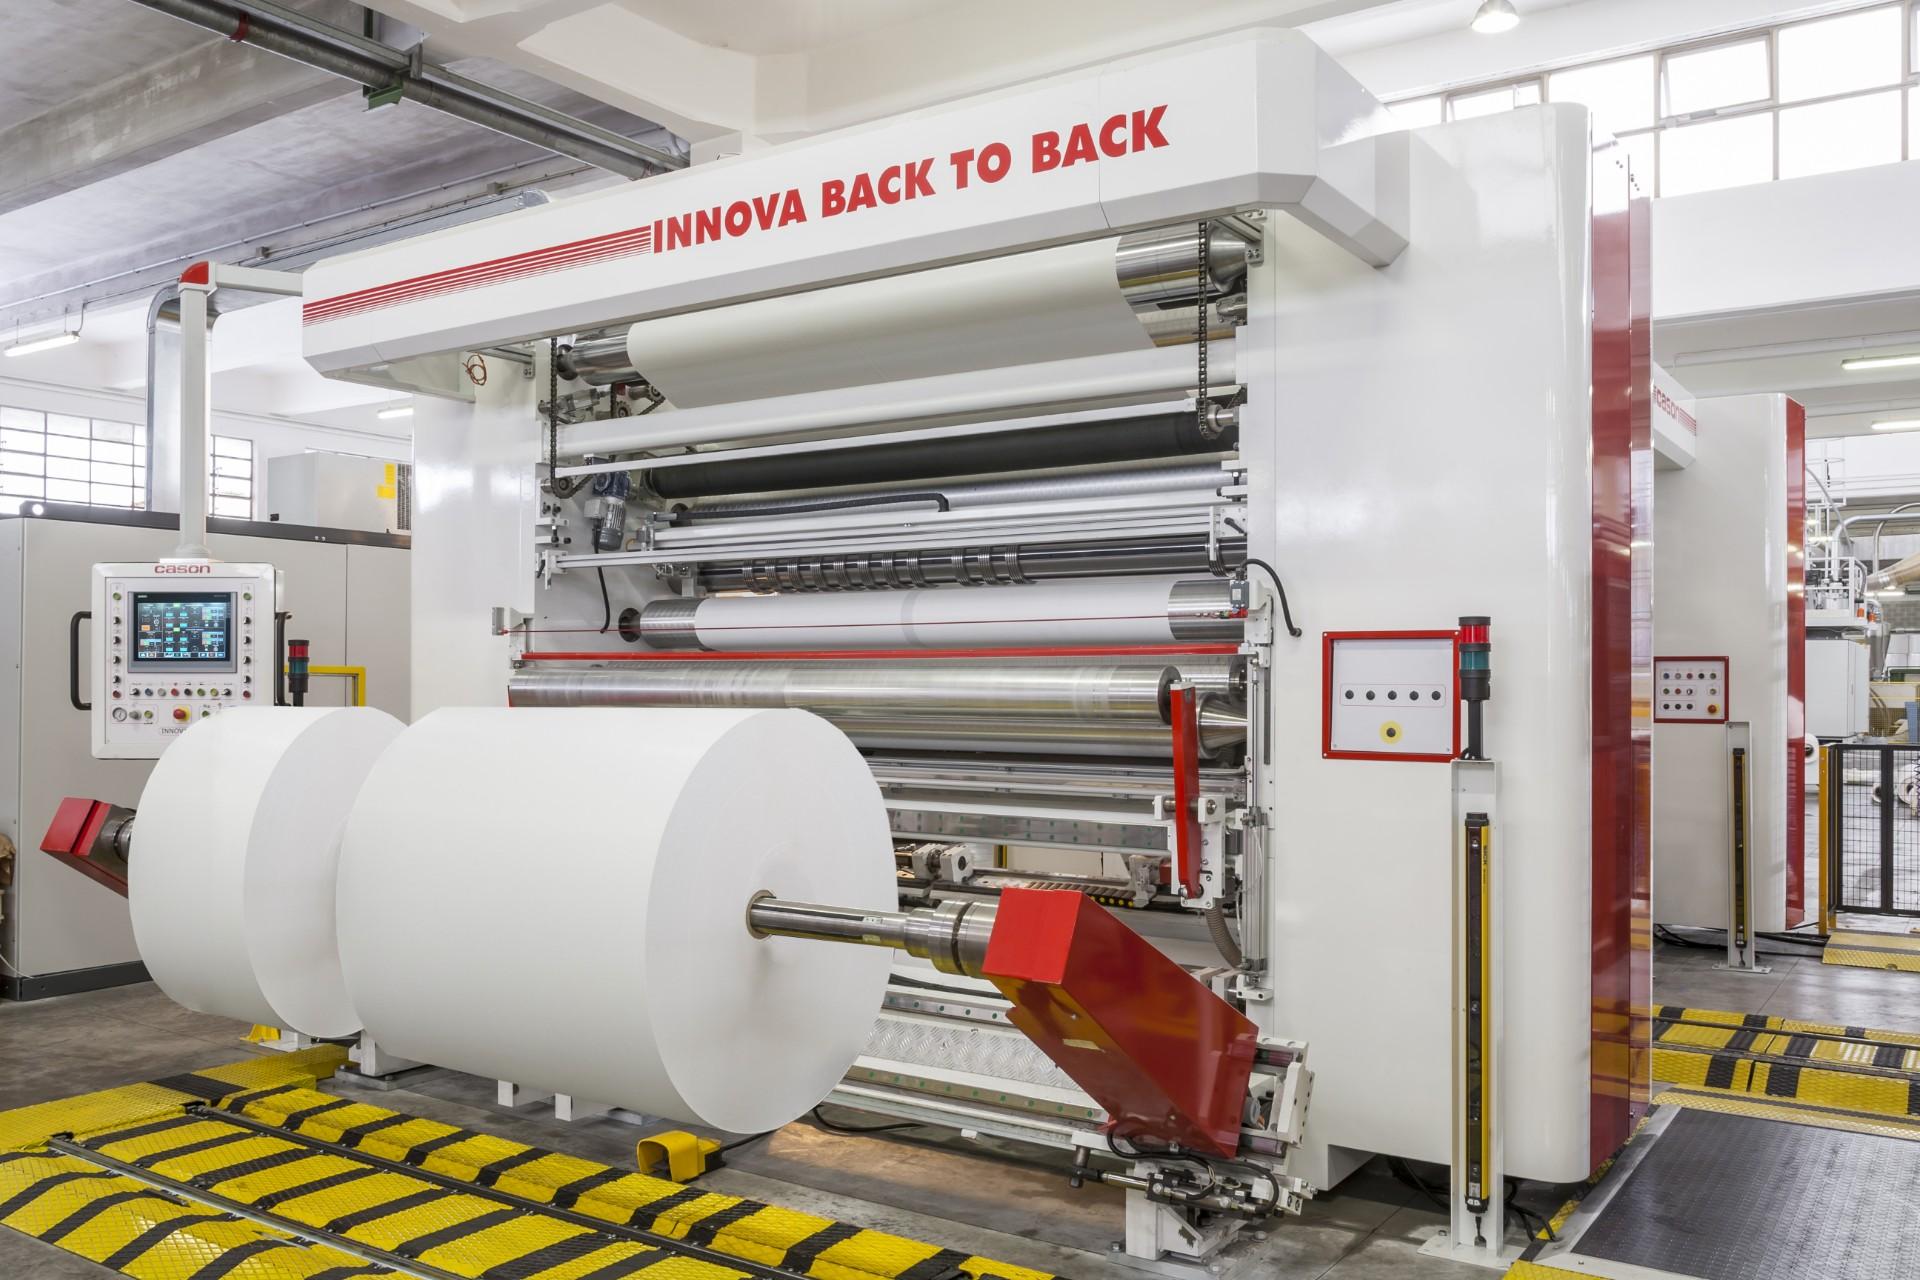 Innova BiBack - Slitter Rewinders - Cason Companies